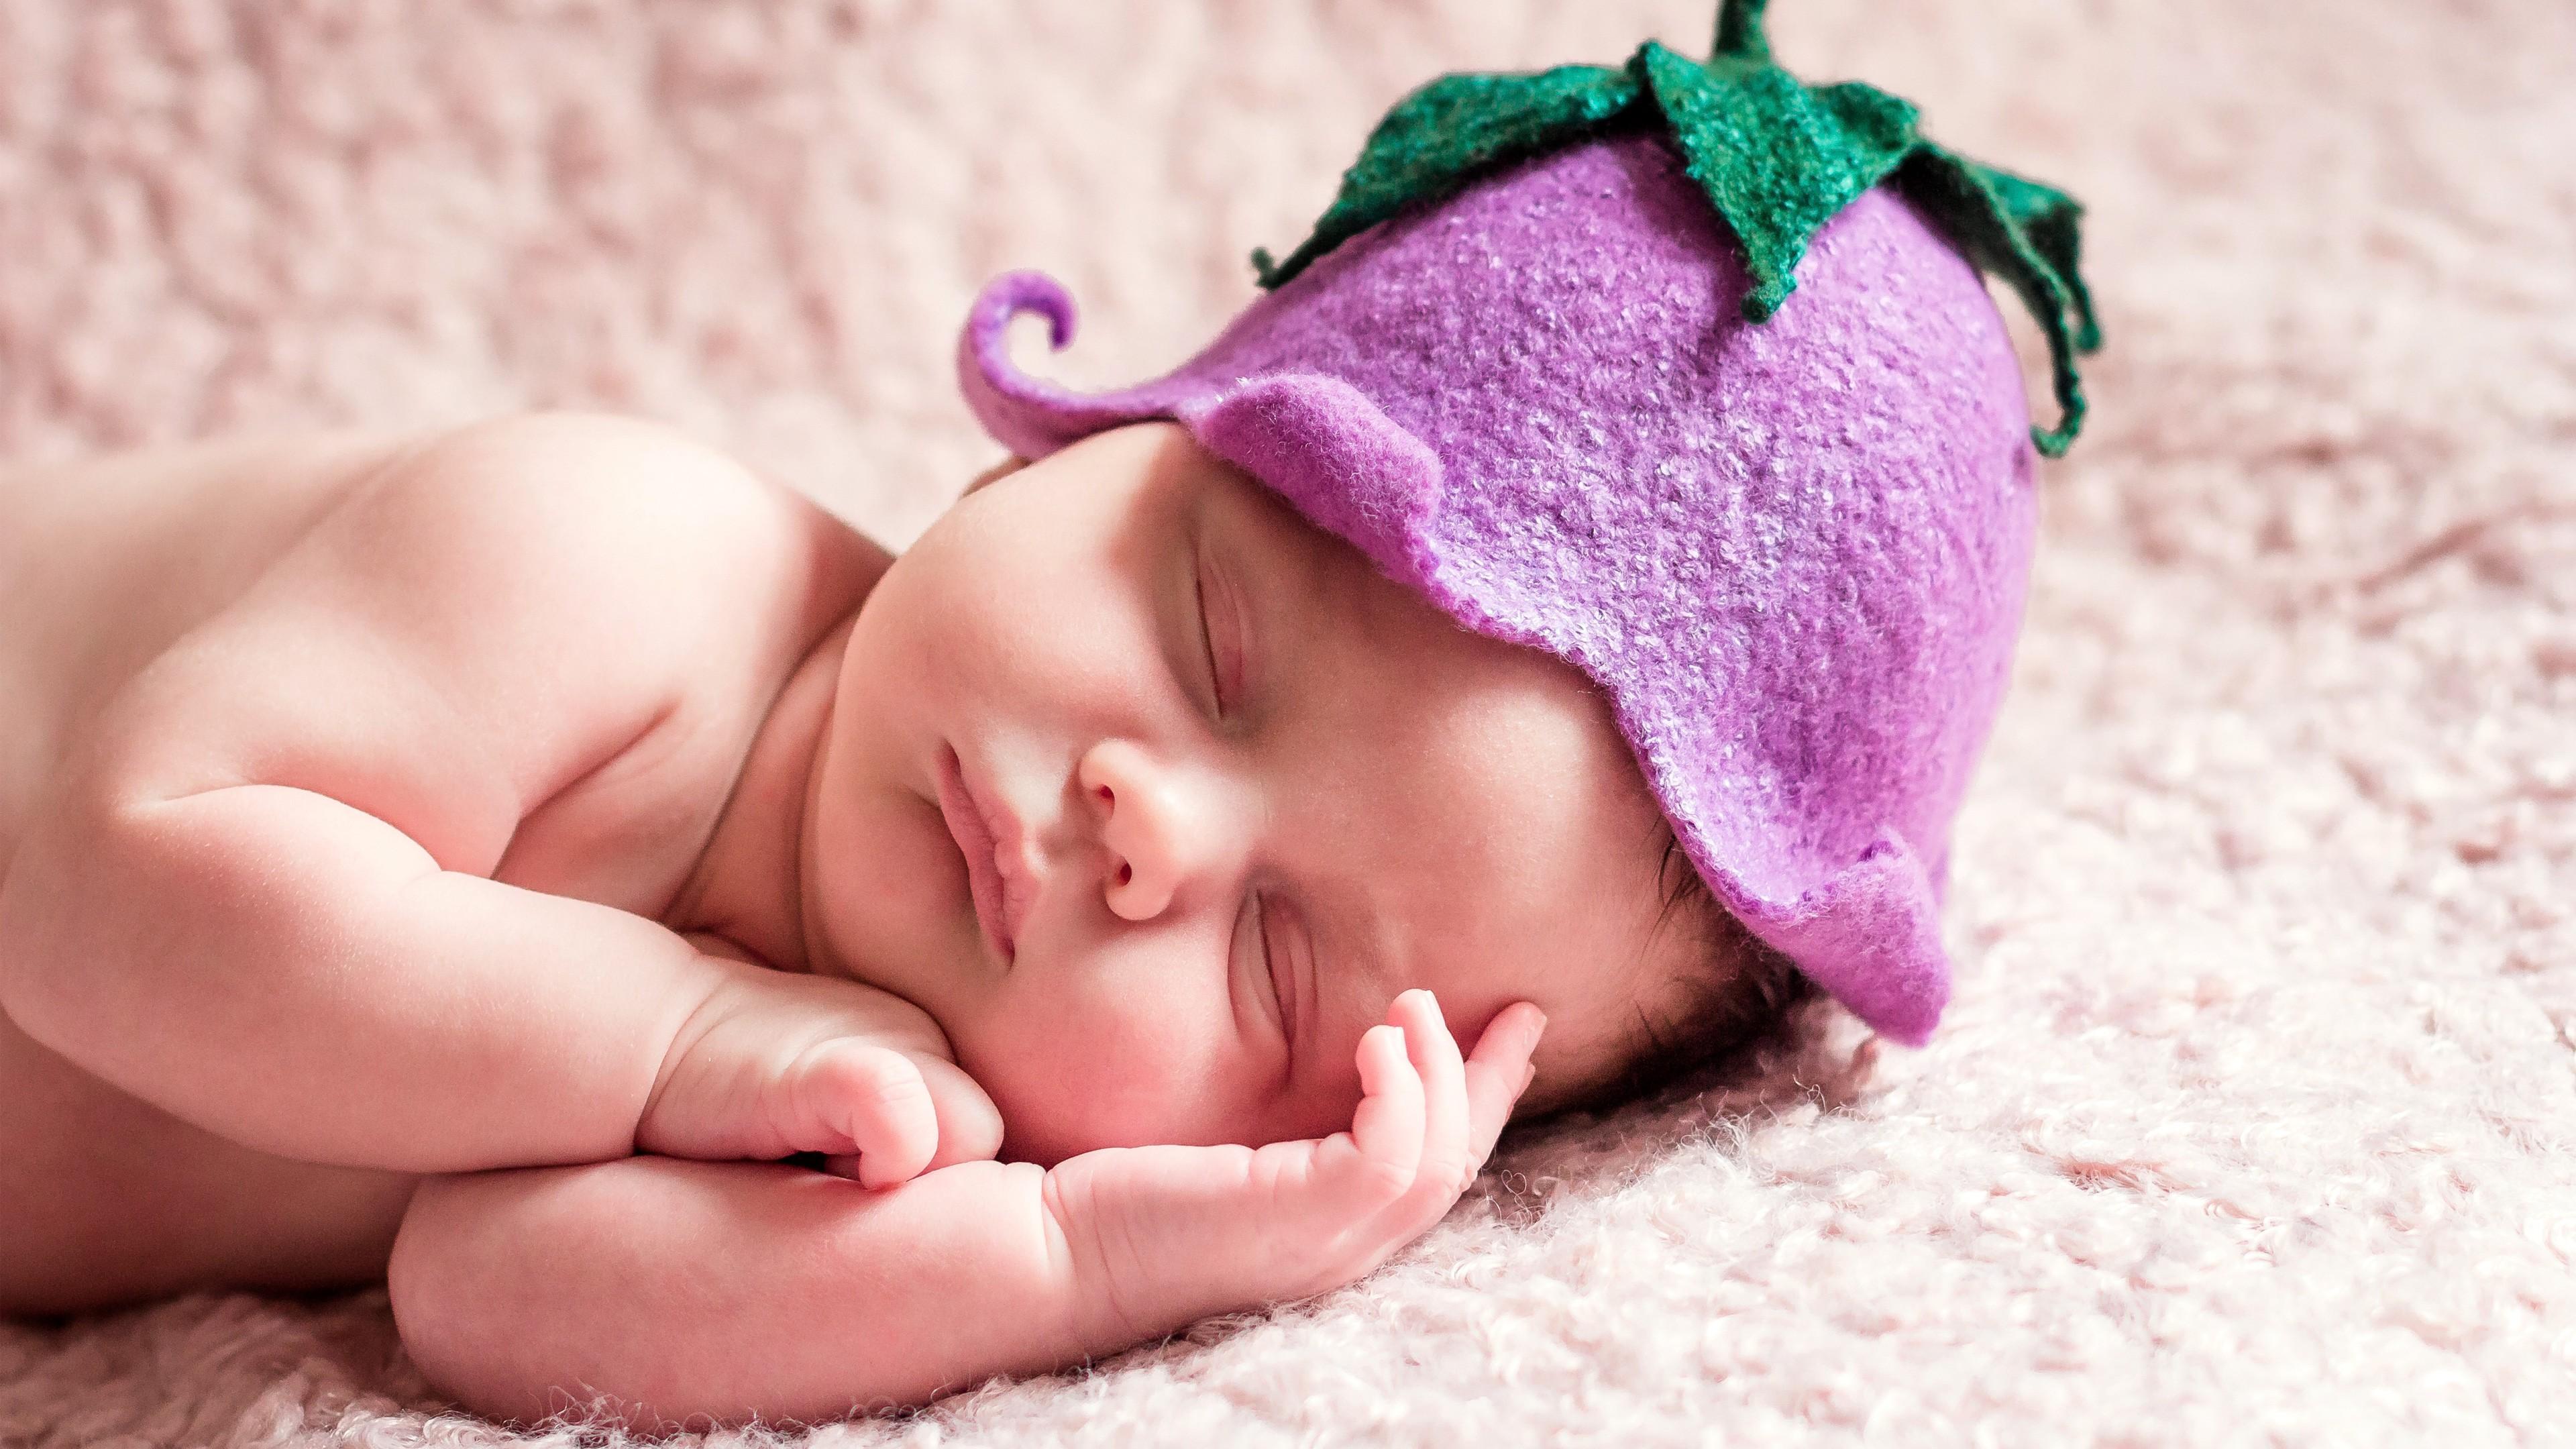 cute_sleeping_newborn_baby-3840x2160